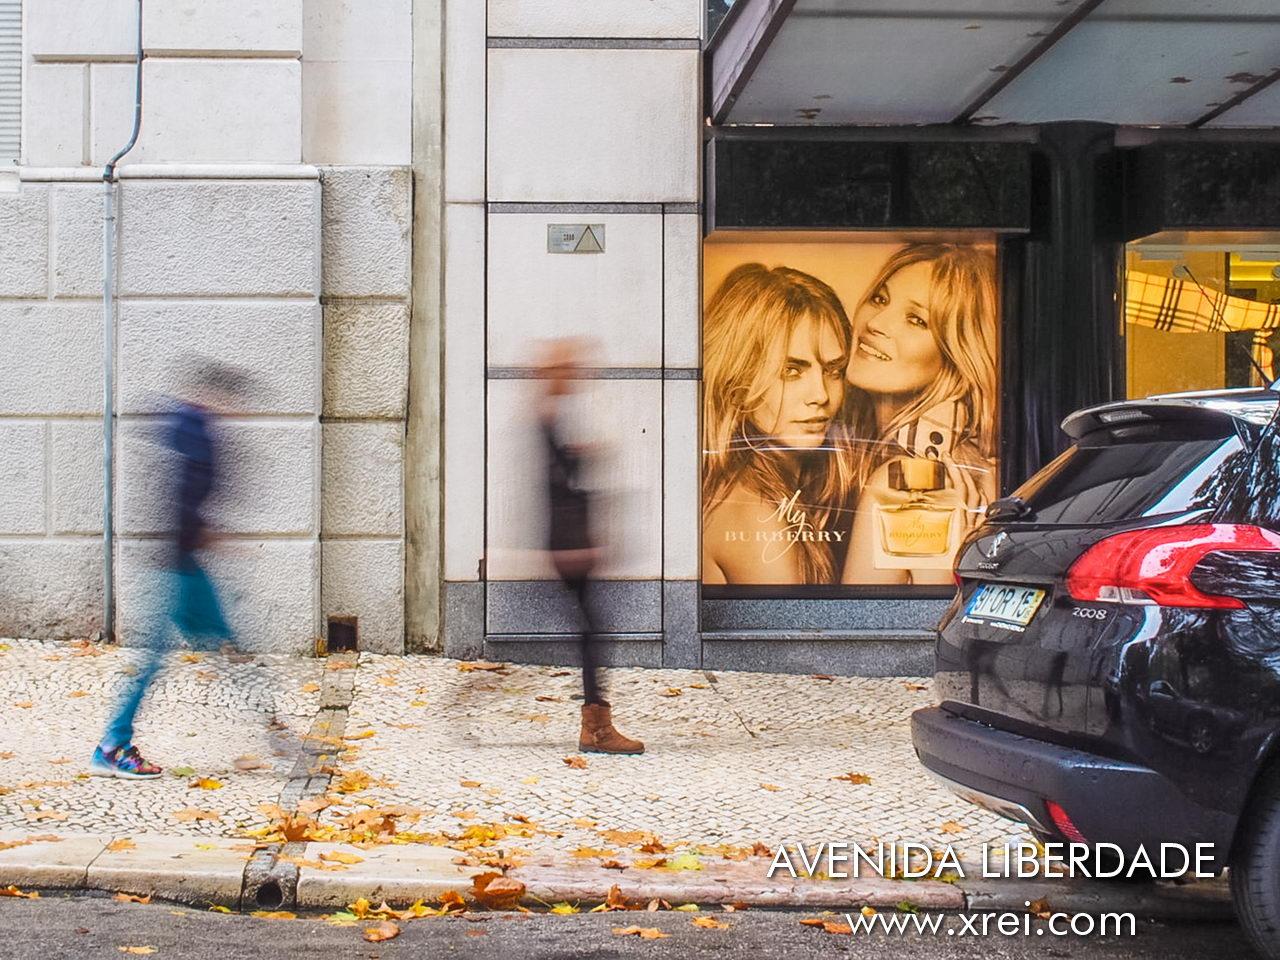 Burberry Avenida da Liberdade, Lisbon